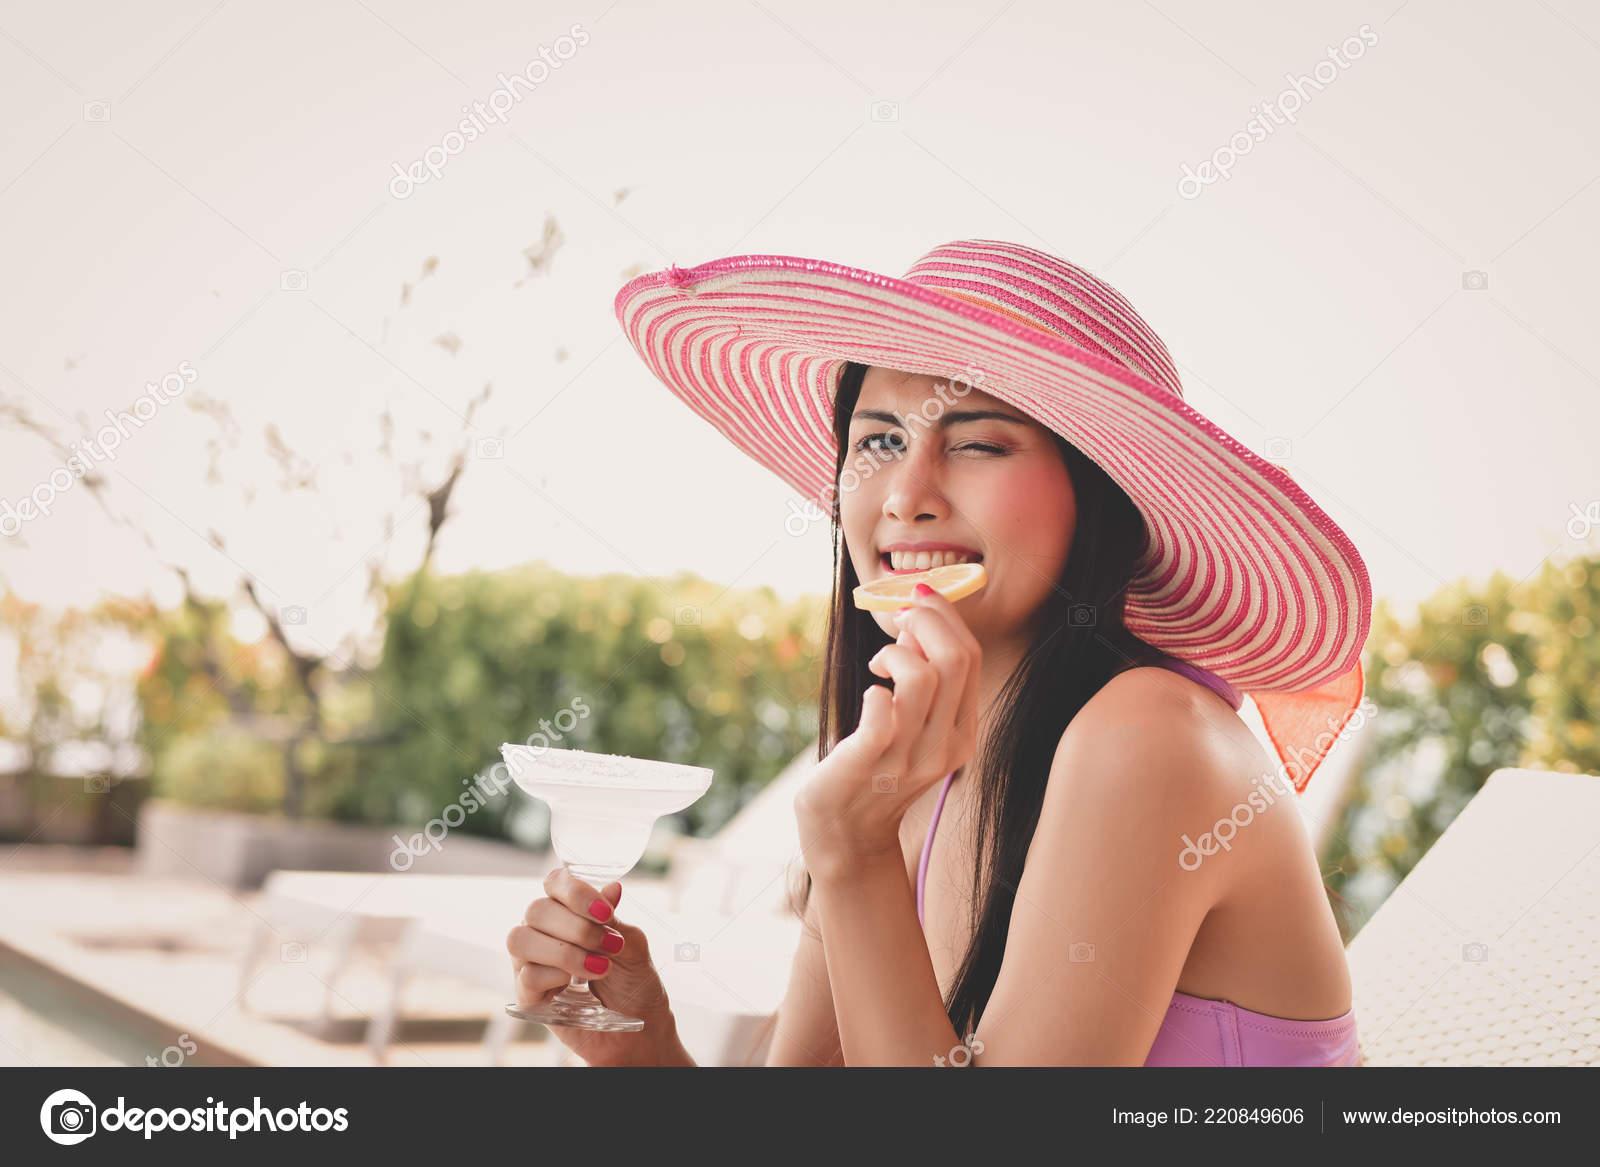 Beautiful girls in swimwear are drinking. Asian girls drink fruit juice at  the pool. Beautiful girl in swimwear is happy at the pool.